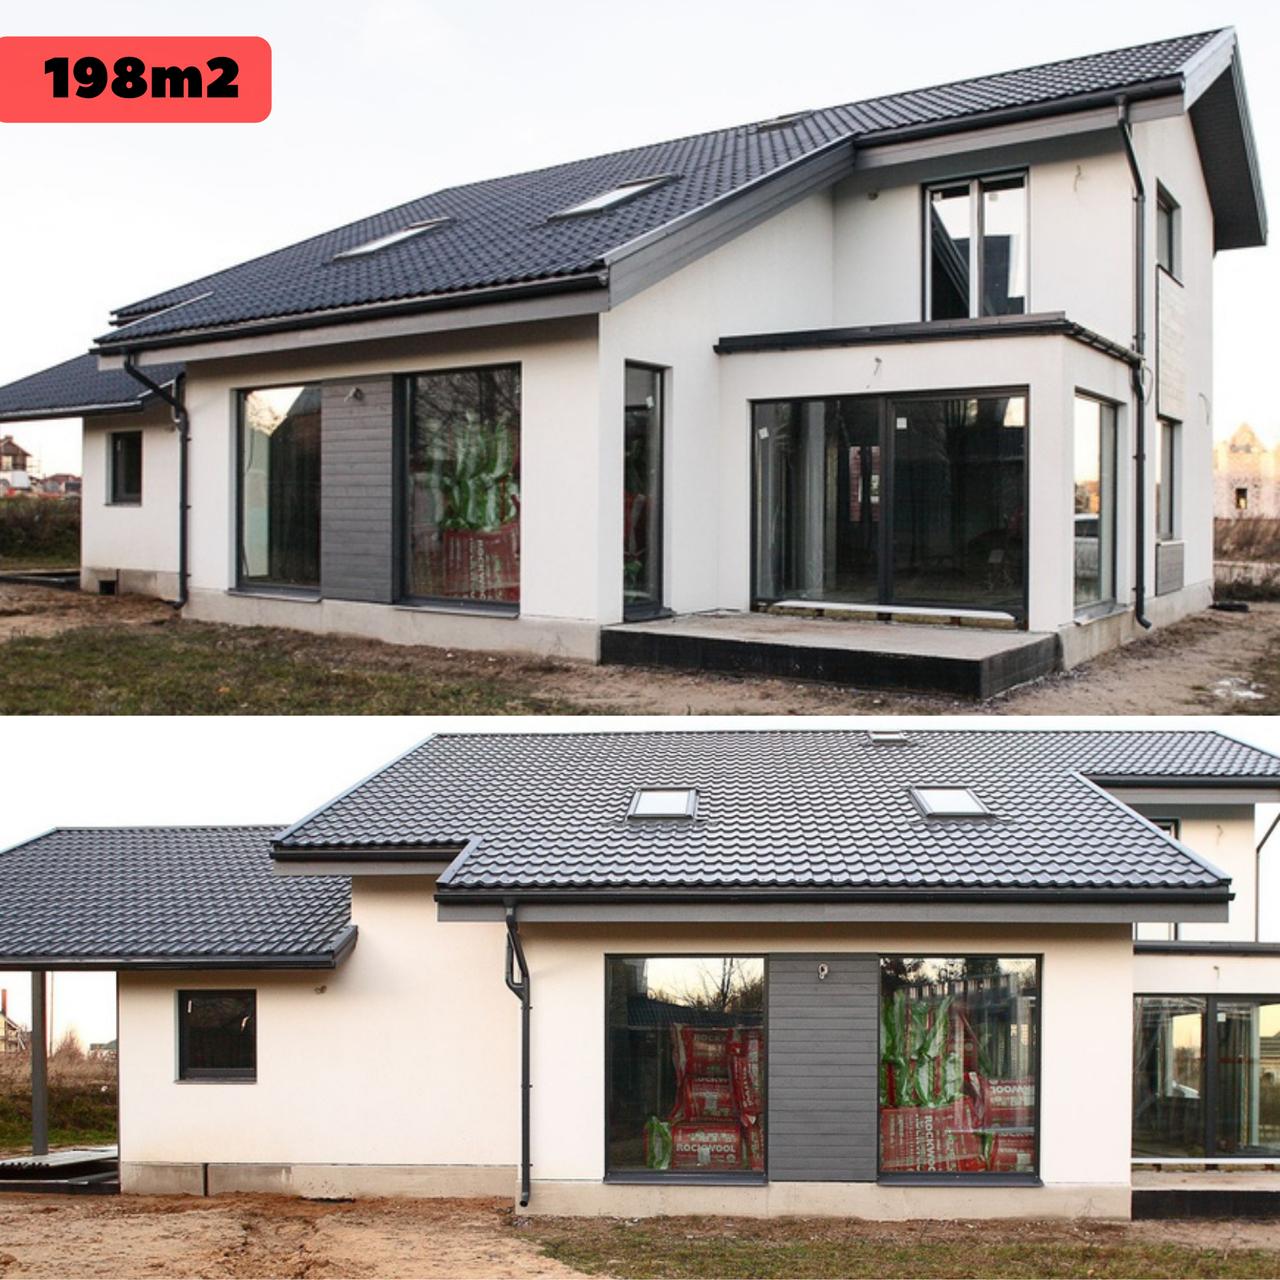 Каркасно модульный дом 198m2 из ЛСТК 17х13m